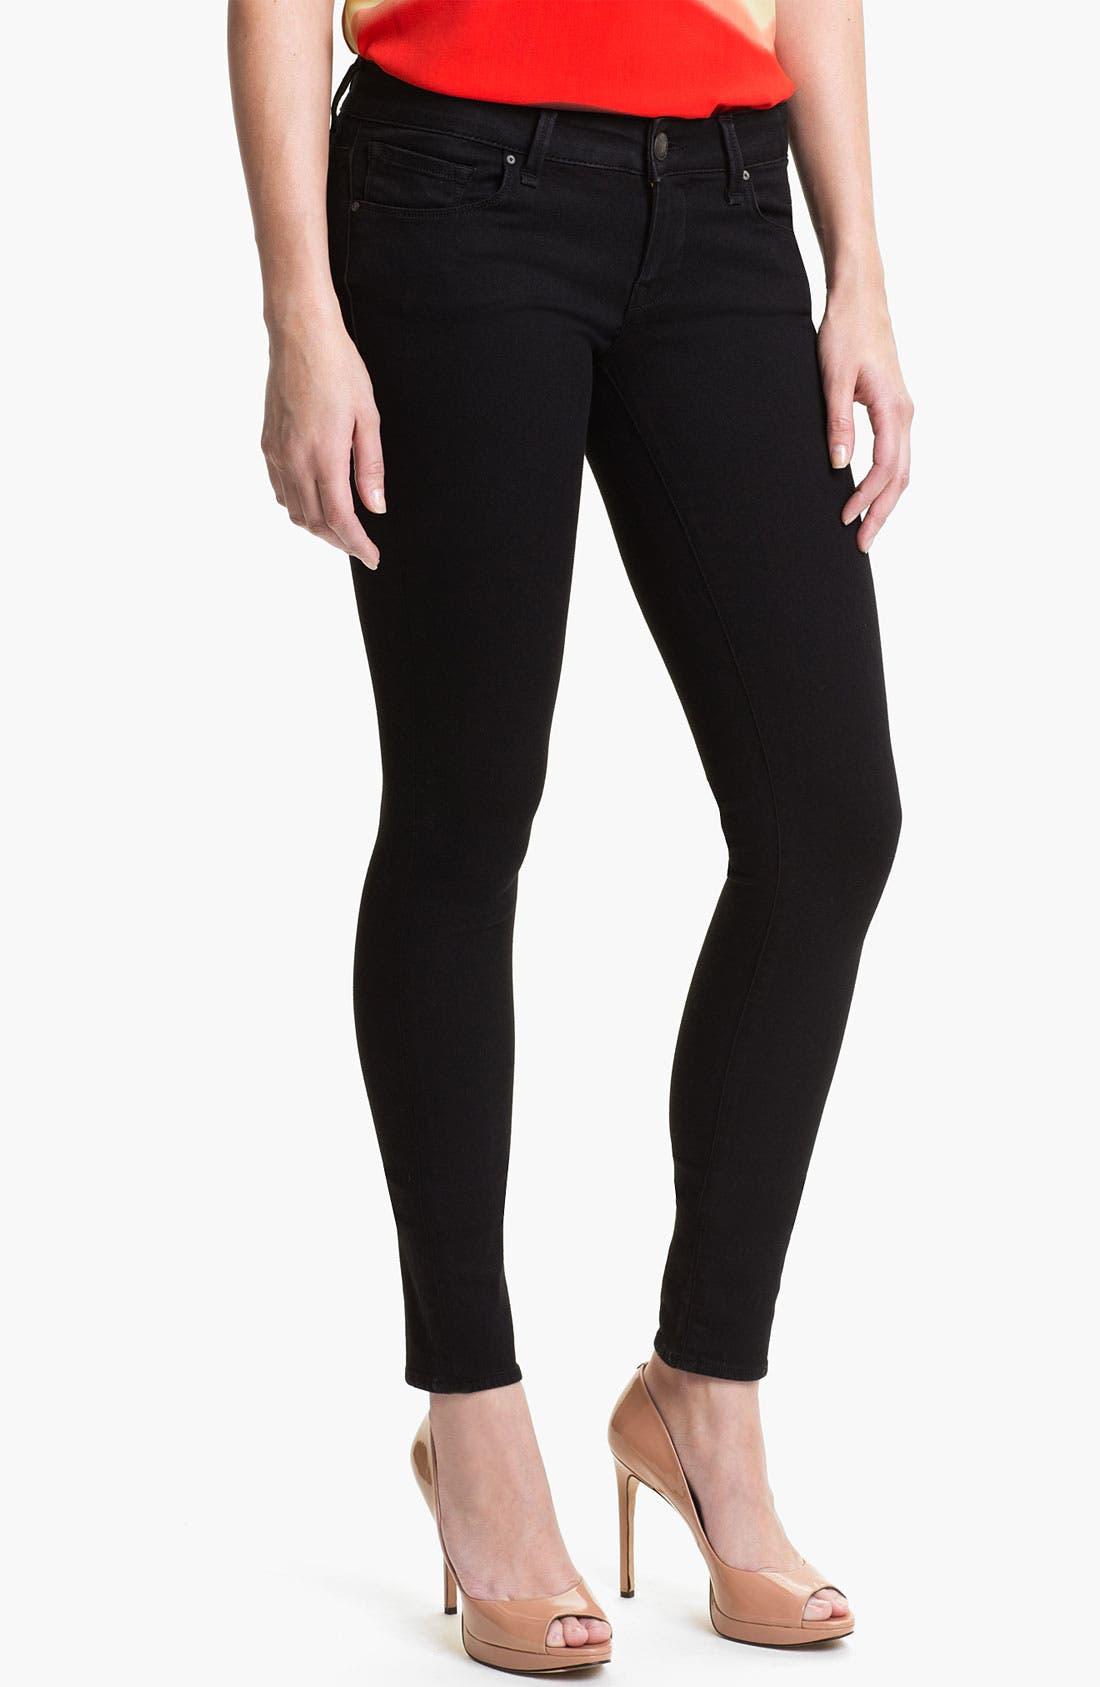 Alternate Image 1 Selected - Mavi Jeans 'Serena' Low Rise Super Skinny Jeans (Black Shanti) (Online Exclusive)